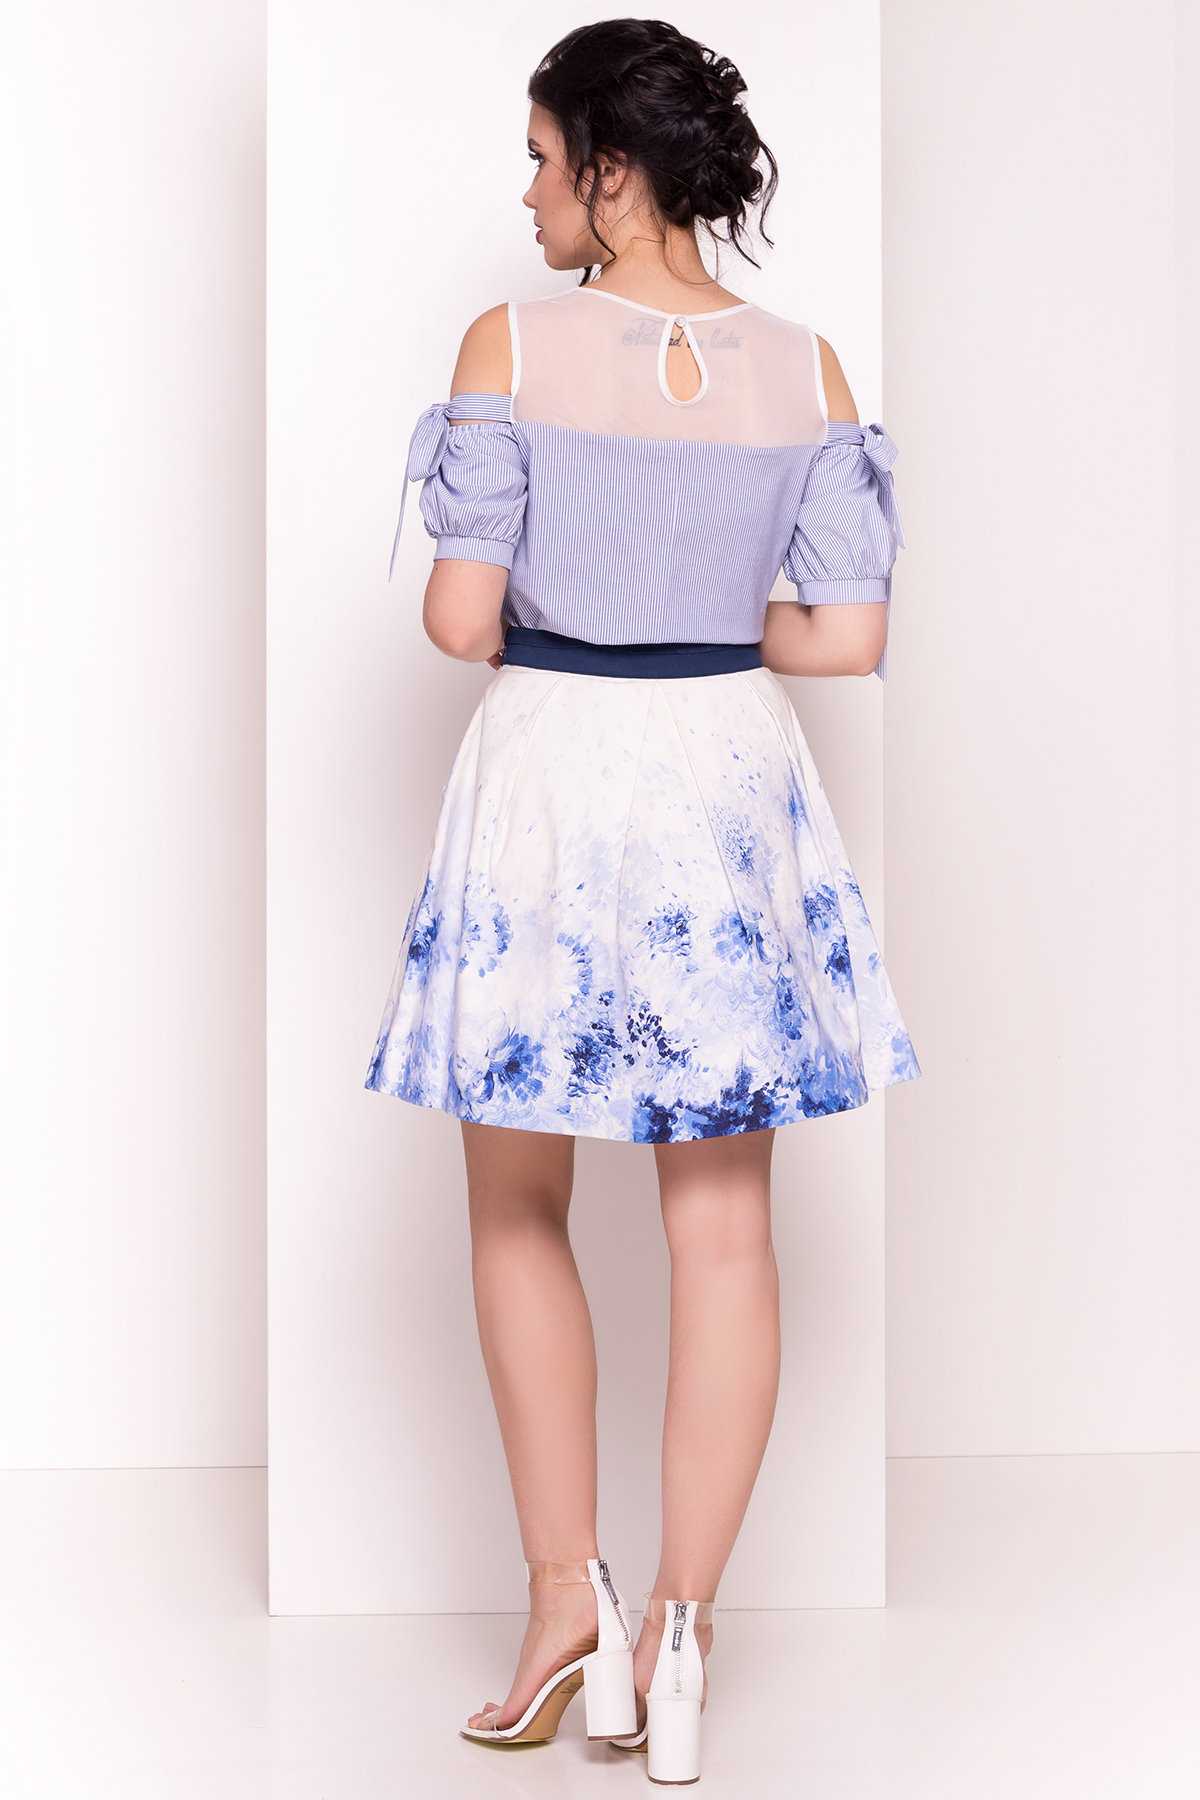 Блуза Океания 5103 Цвет: Темно-синий/белый